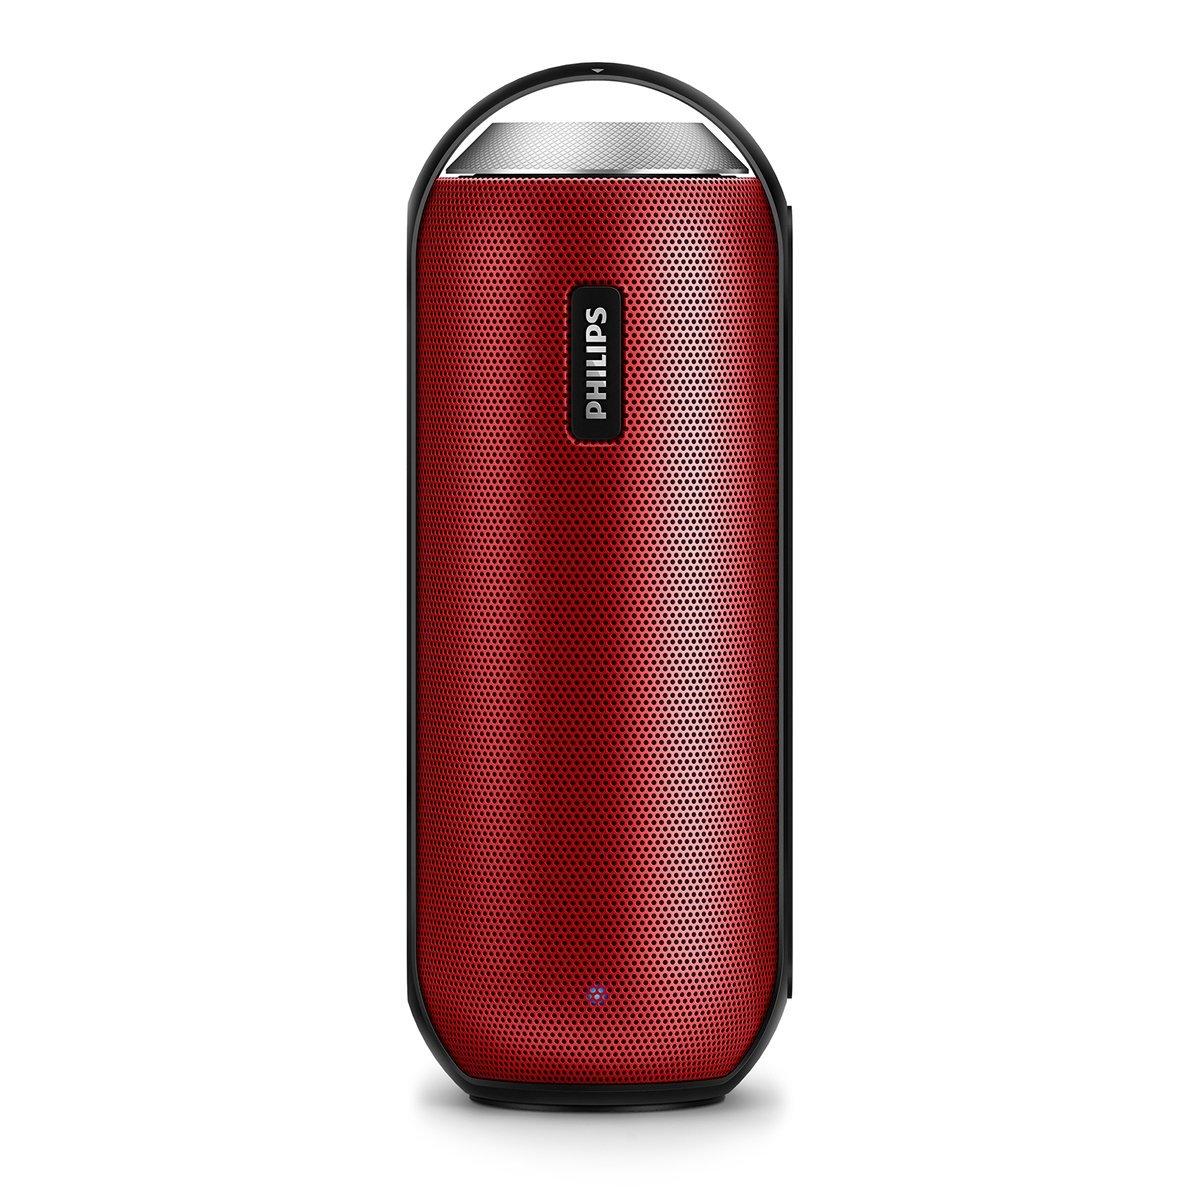 Philips BT6000R/37 Splash-Proof Wireless Portable Speaker (Red) $39.99